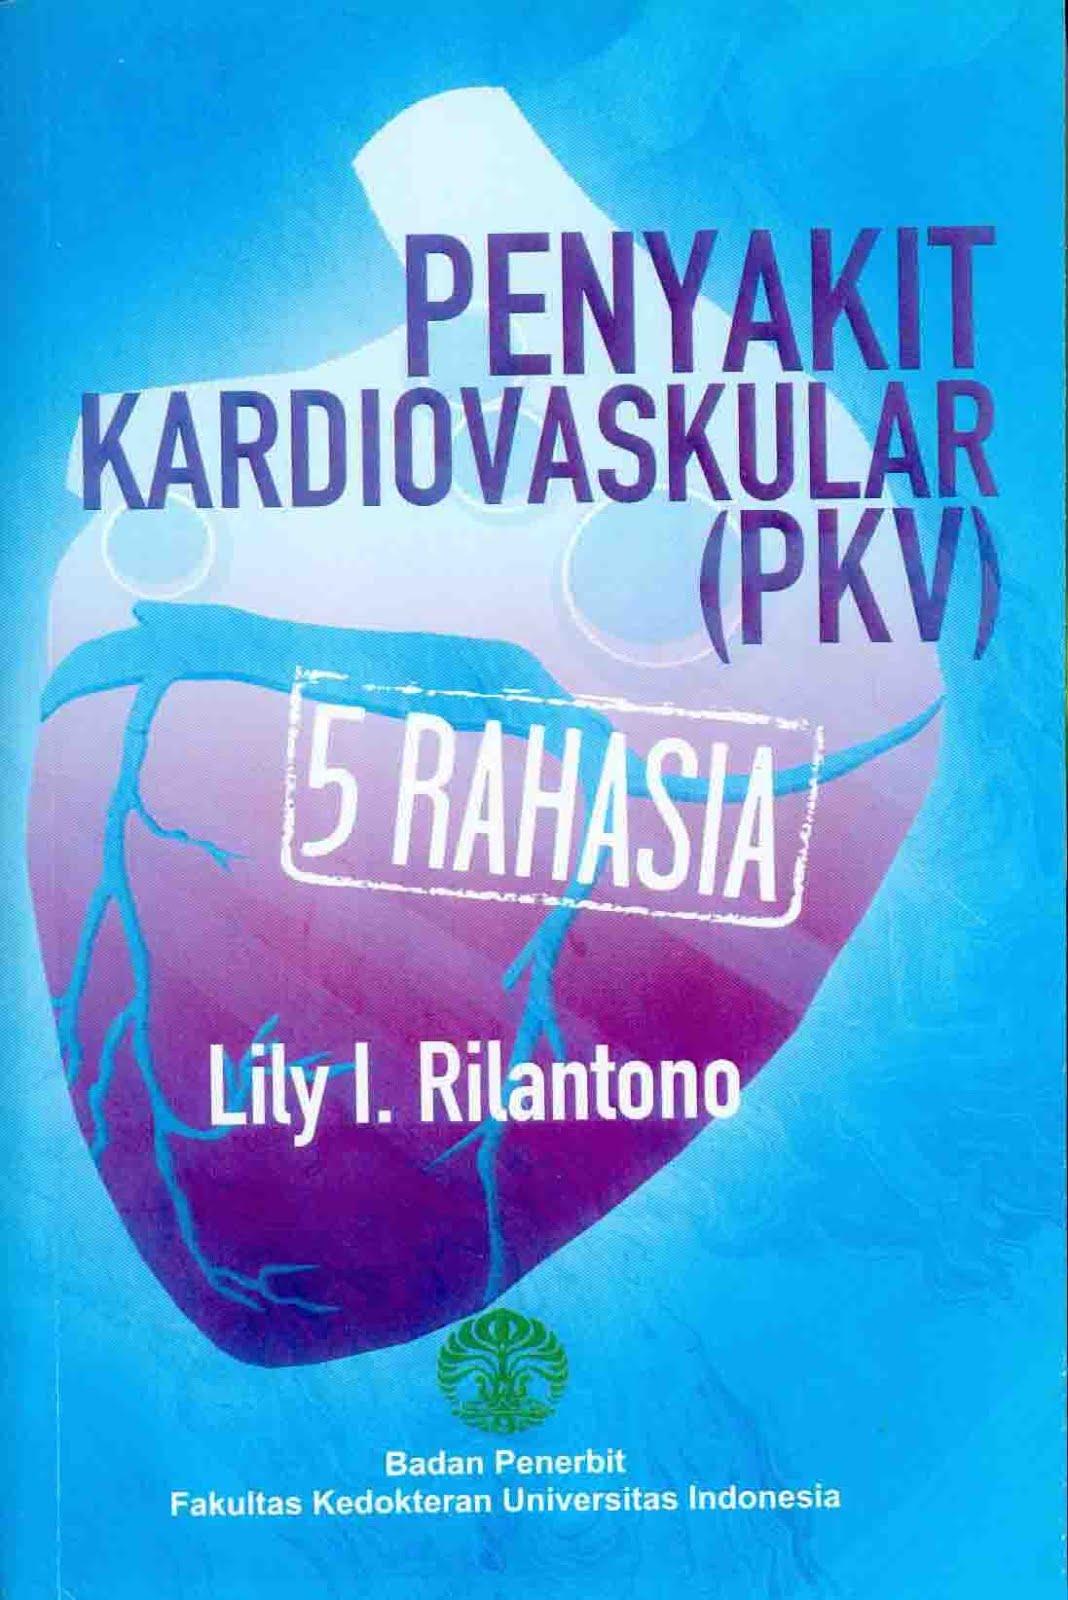 Buku PENYAKIT KARDIOVASKULAR 5 RAHASIA